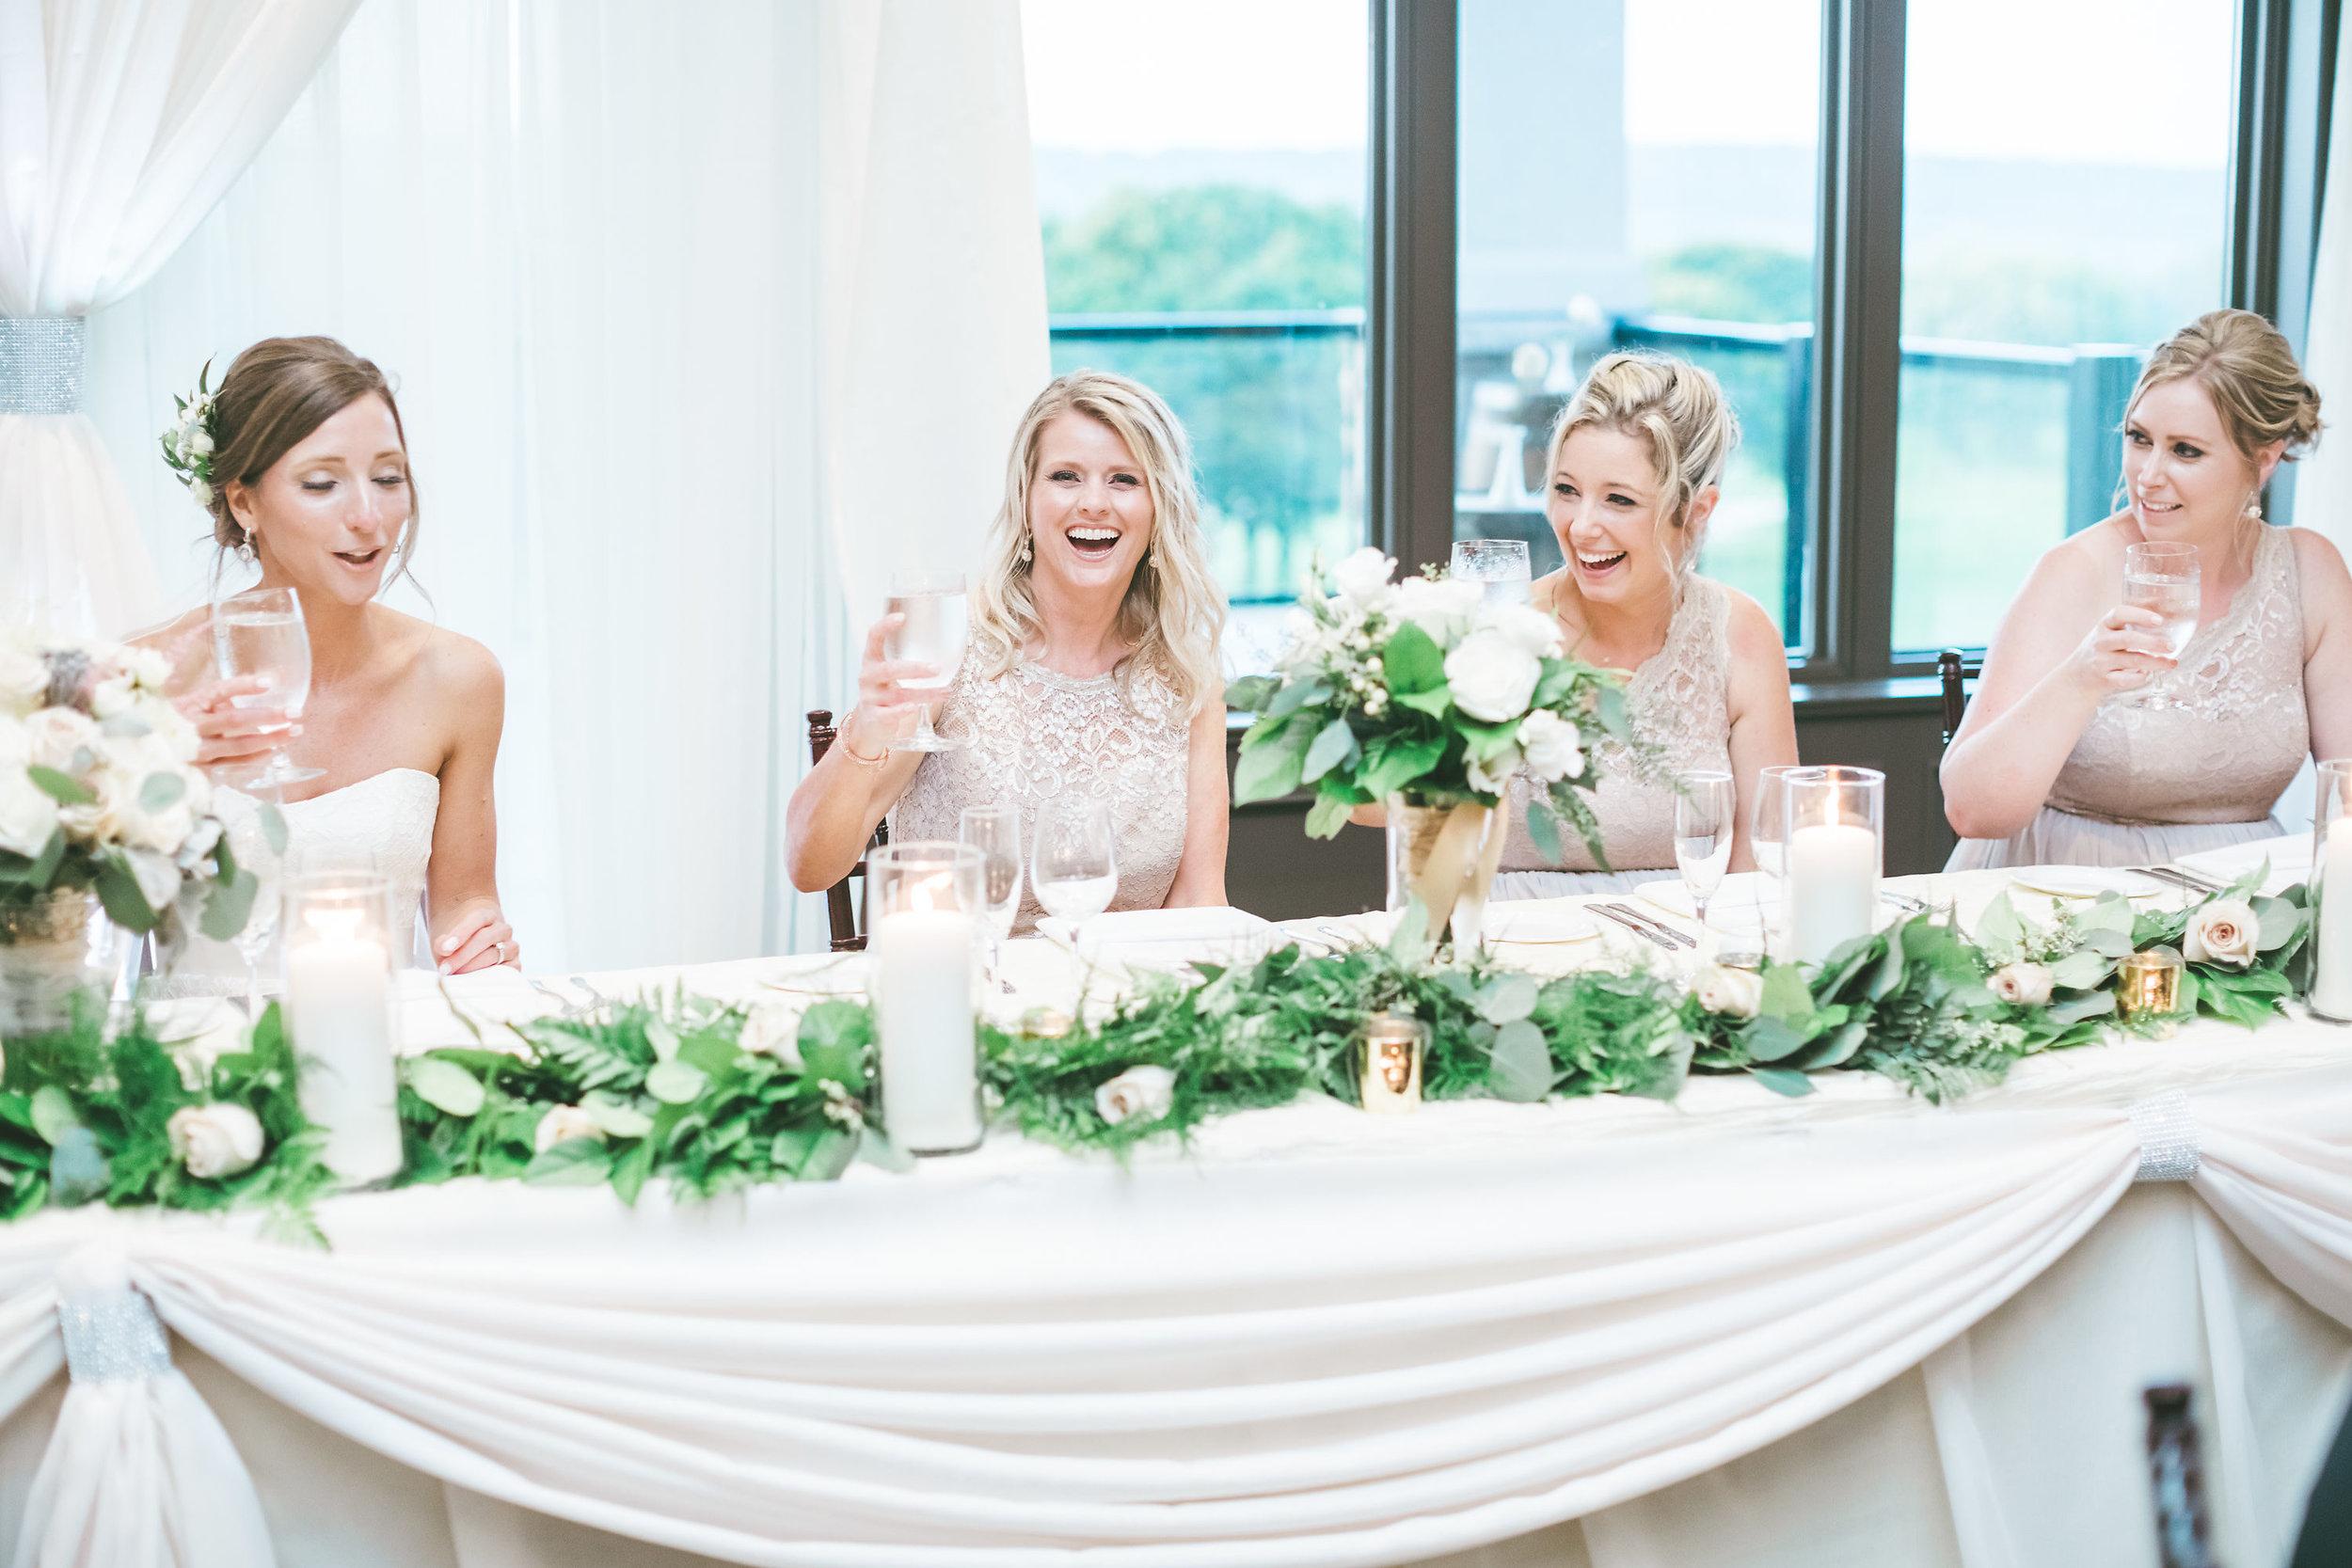 meaghan___darryl_wedding___danielcarusophotography___1241.jpg